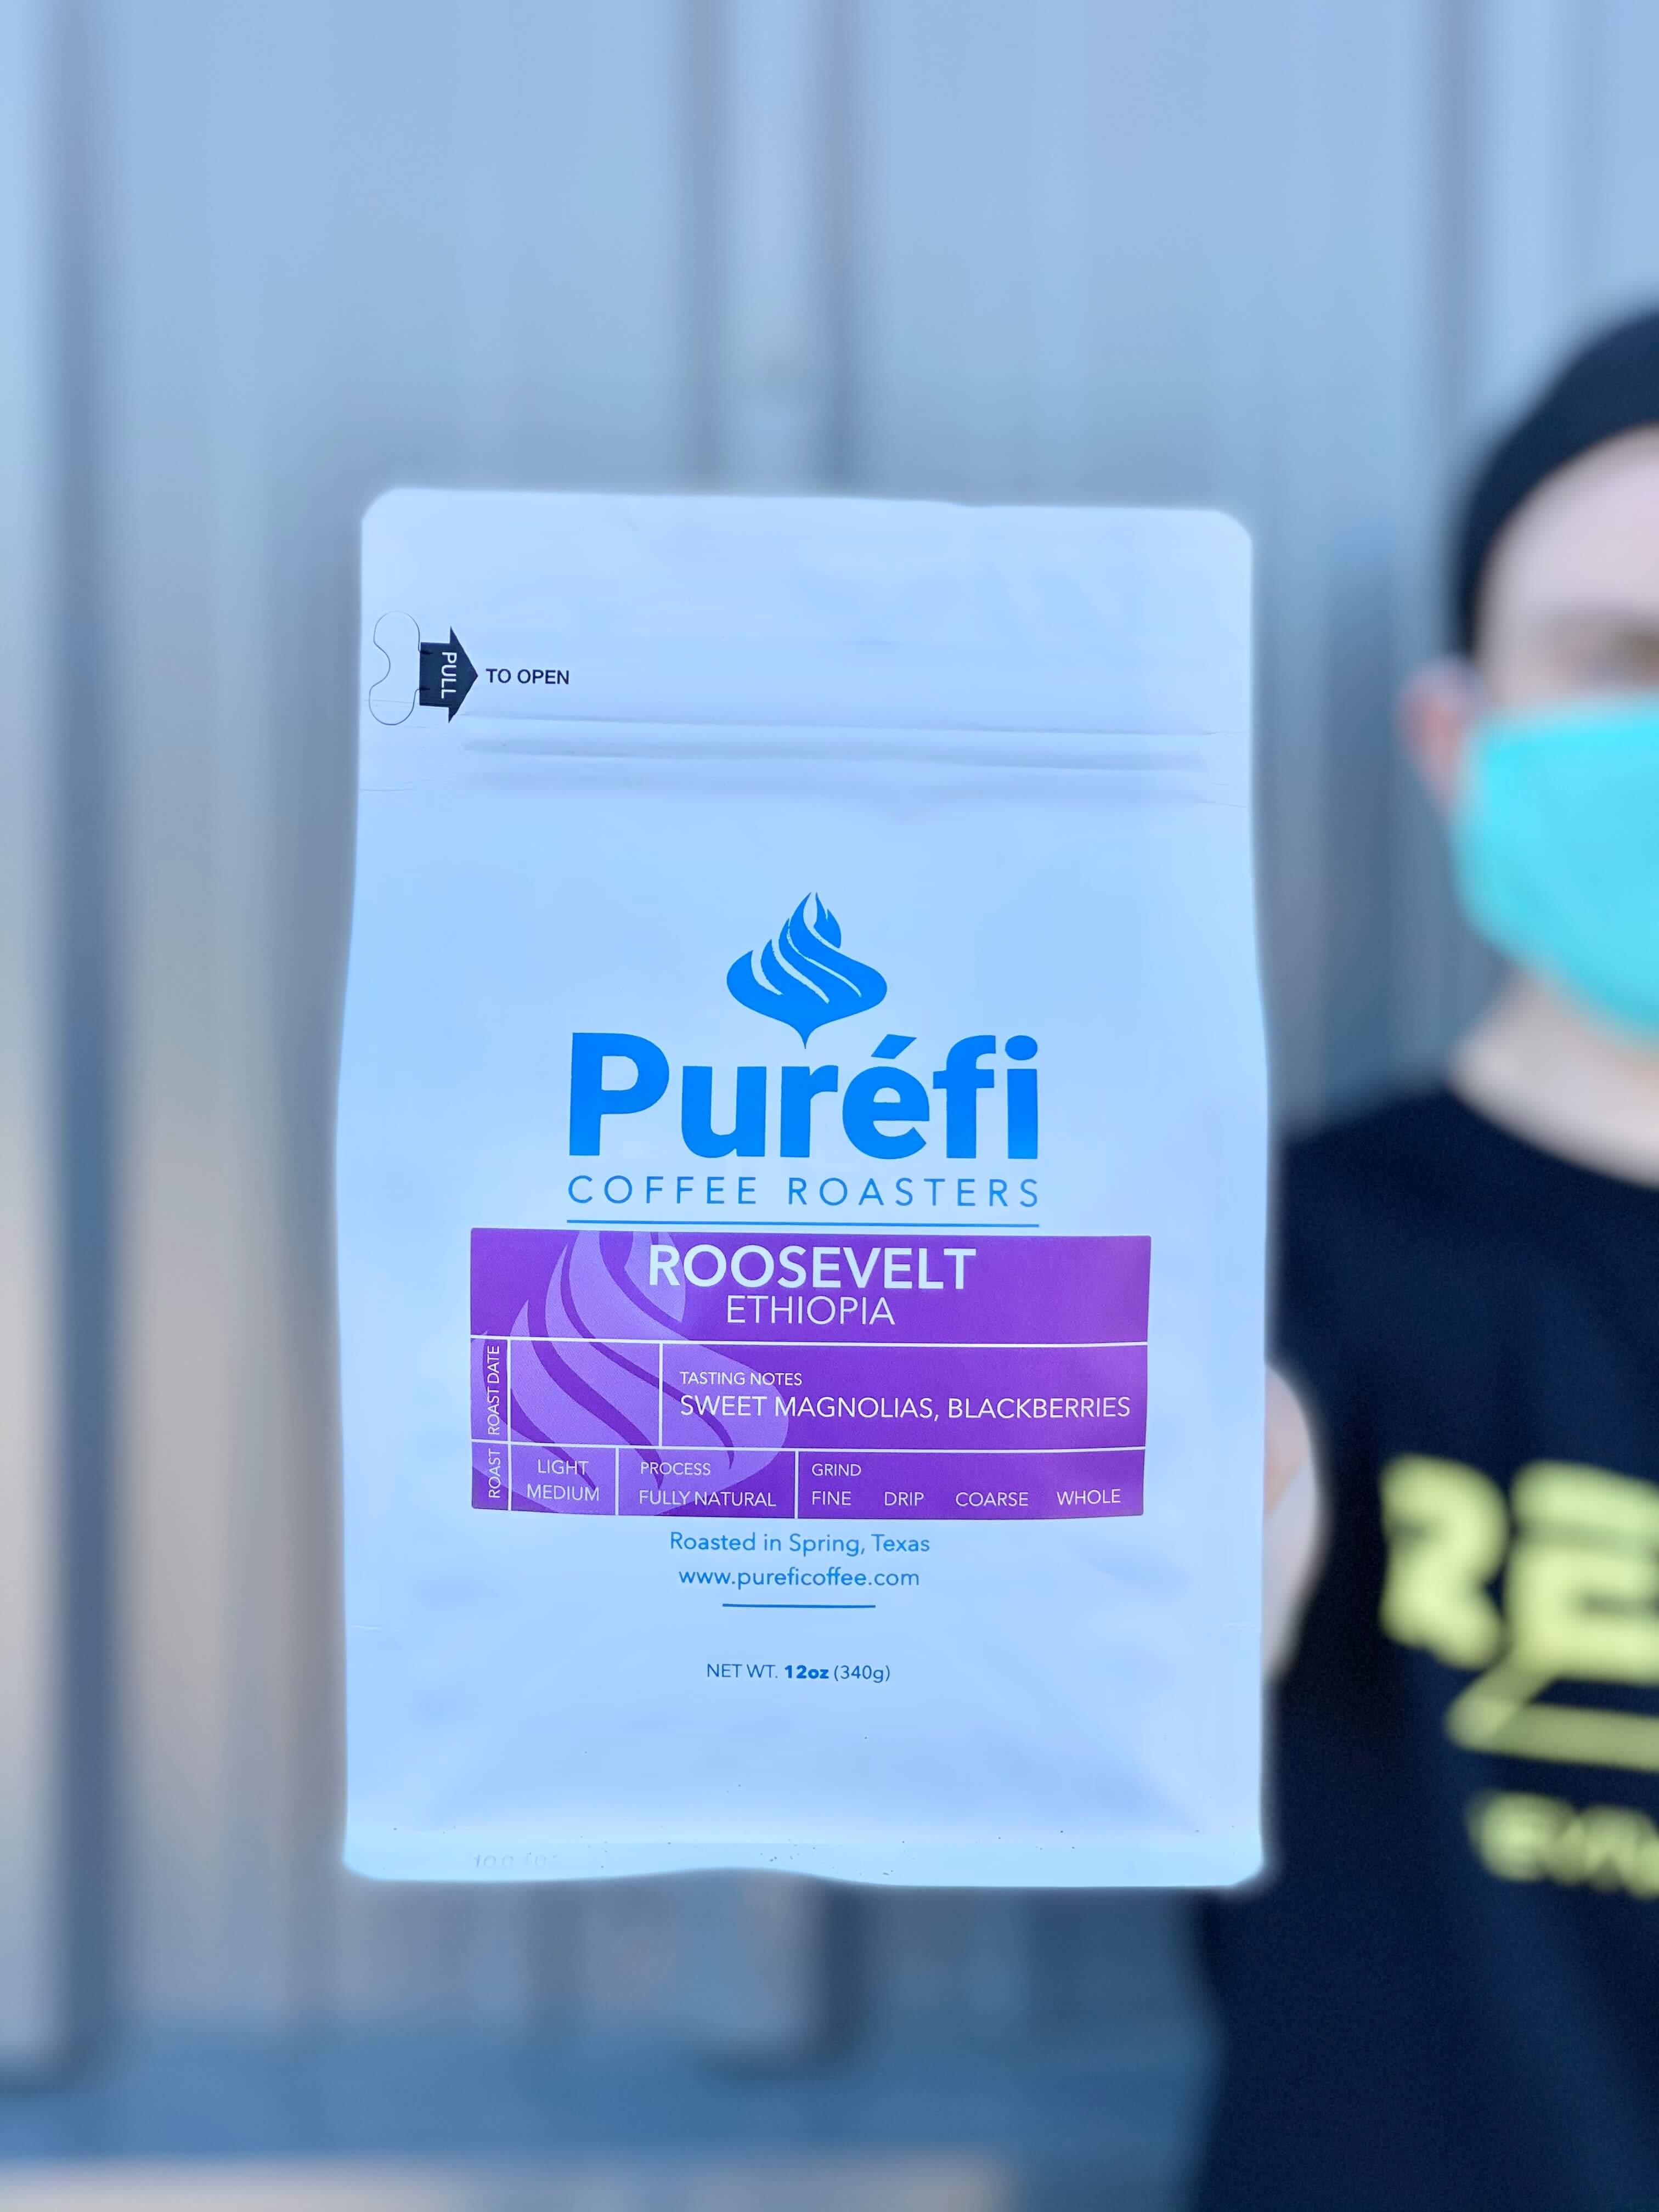 Roosevelt from Purefi Coffee Roasters